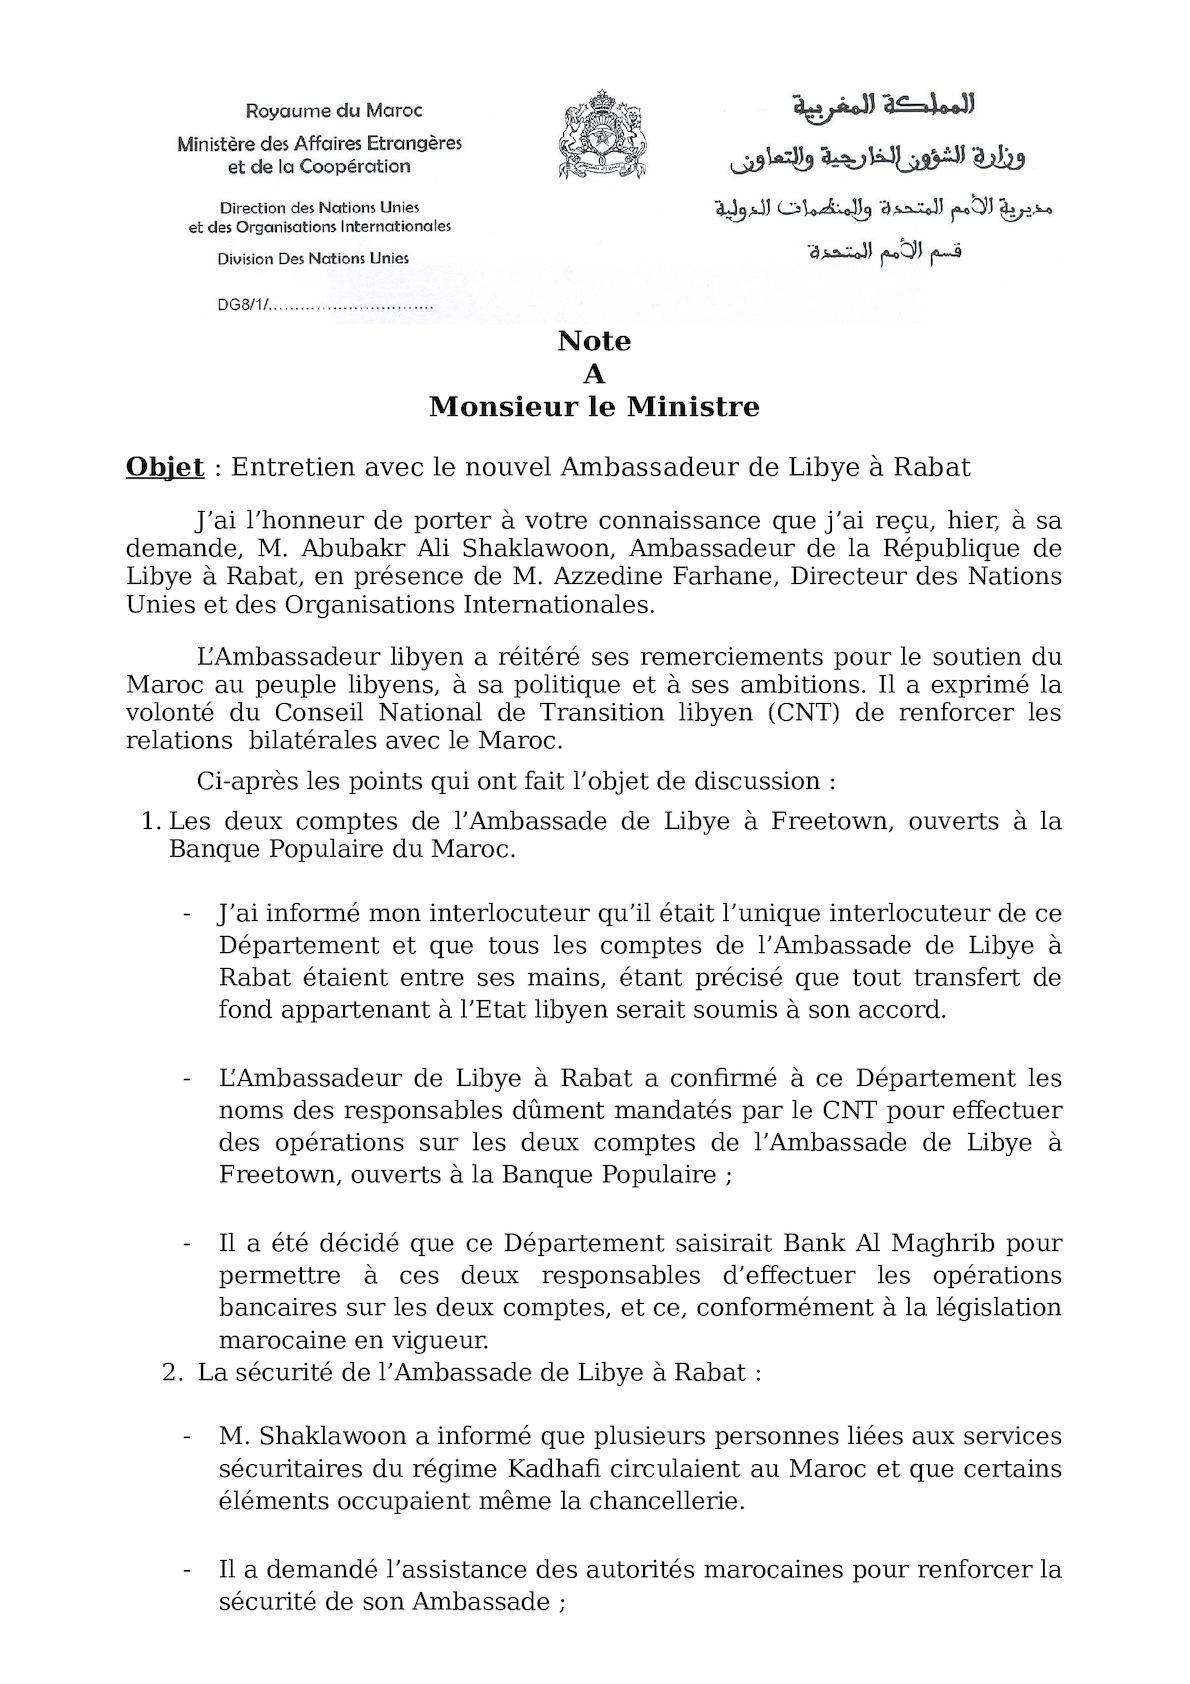 Entretiens Avec Amb Libye Rabat 12 Janvier 2012